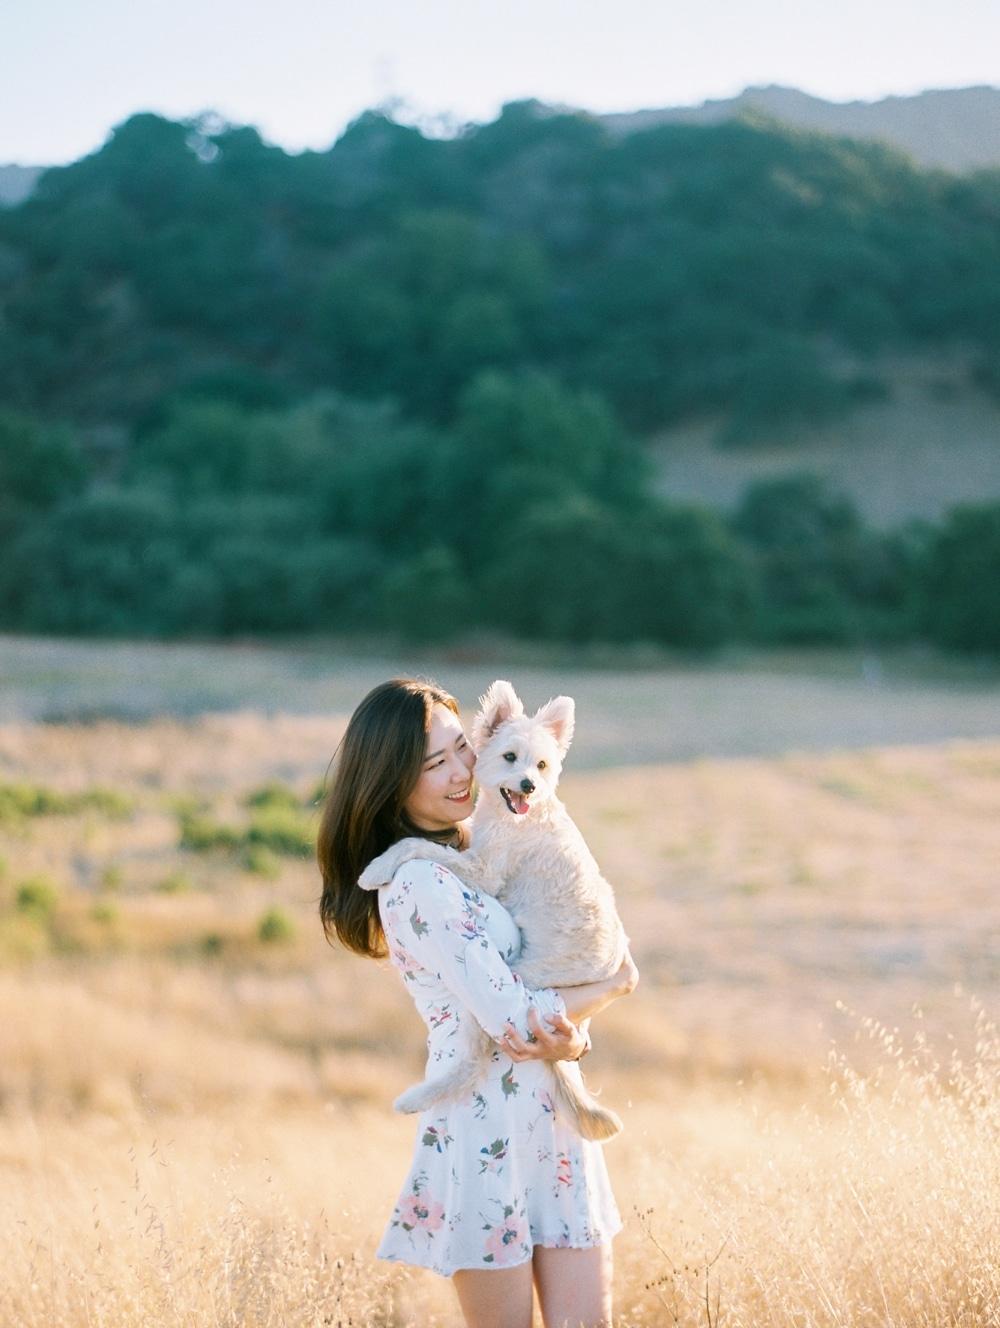 Kristin-La-Voie-Photography-california-wedding-photographer-dog-session-rancho-san-antonio-los-altos-9